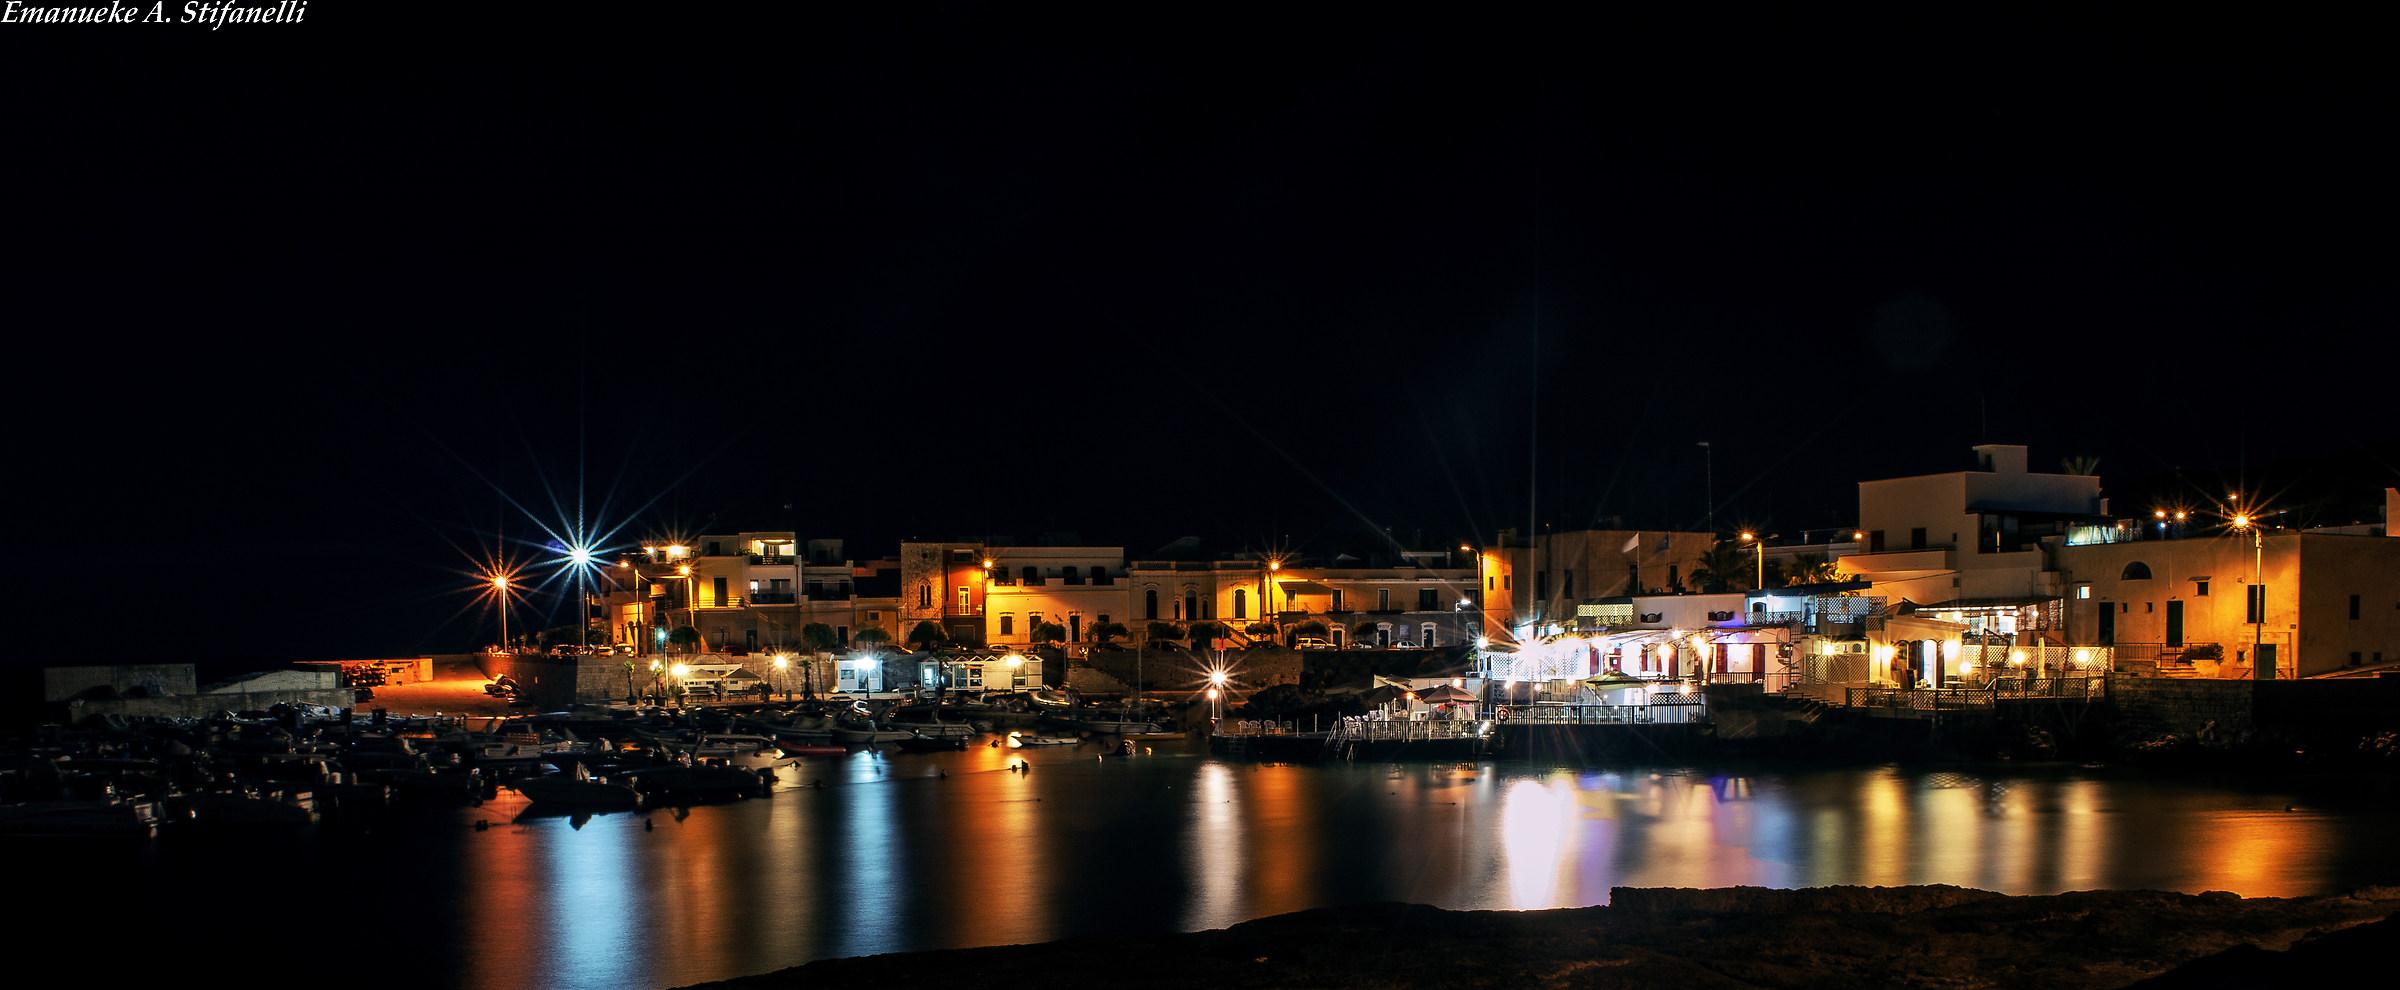 Santa Caterina al Bagno (Salento)...